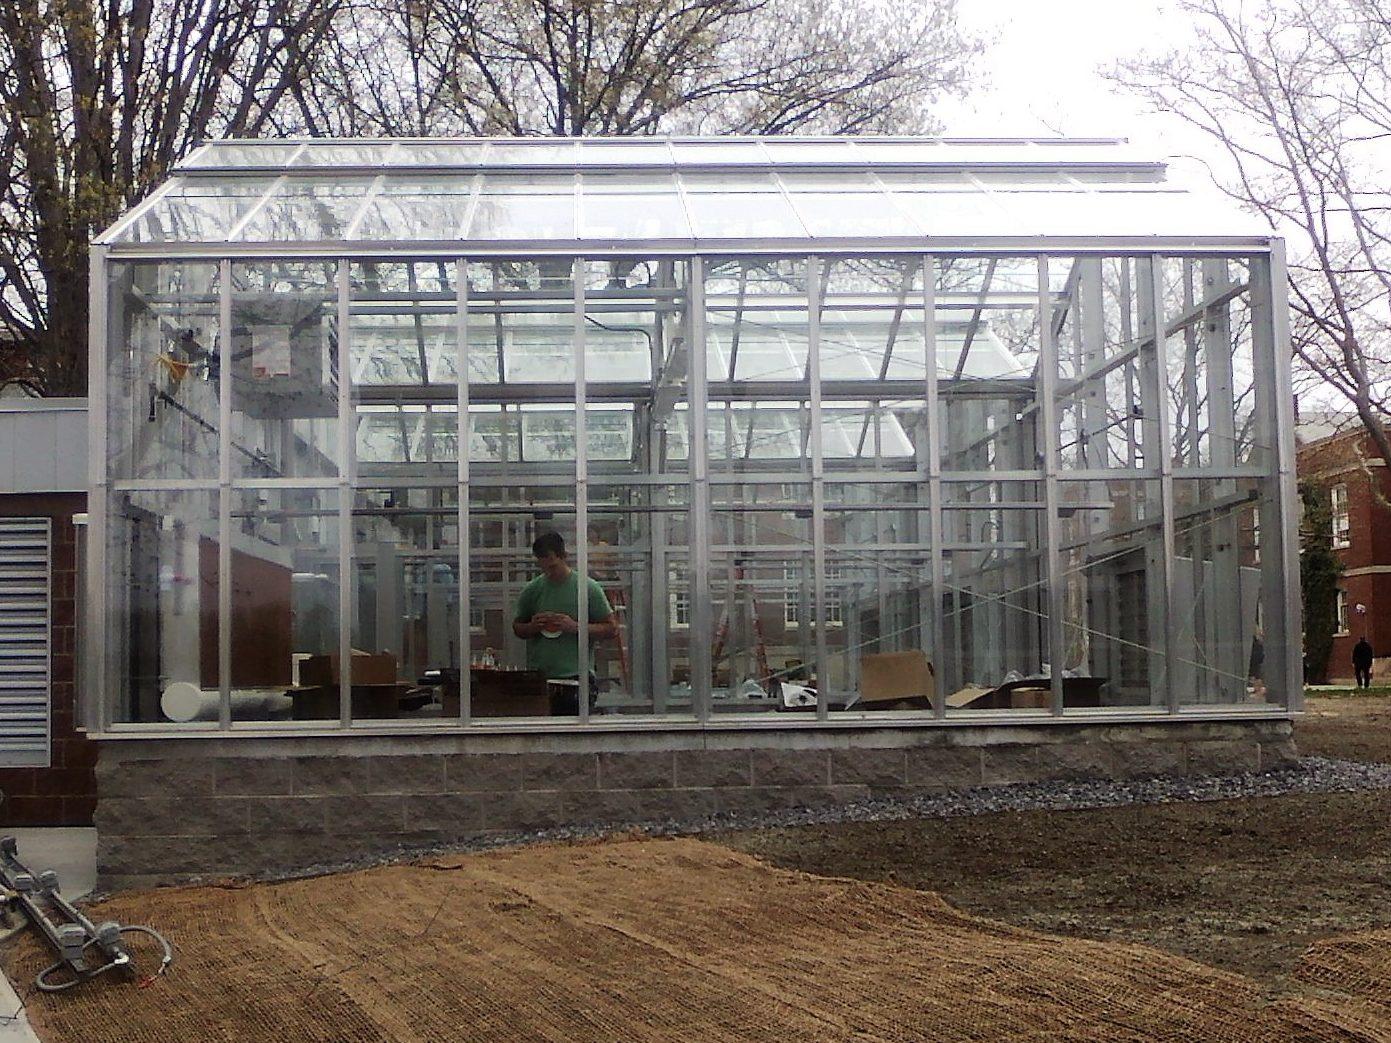 BOWERS GREENHOUSE – SUNY CORTLAND